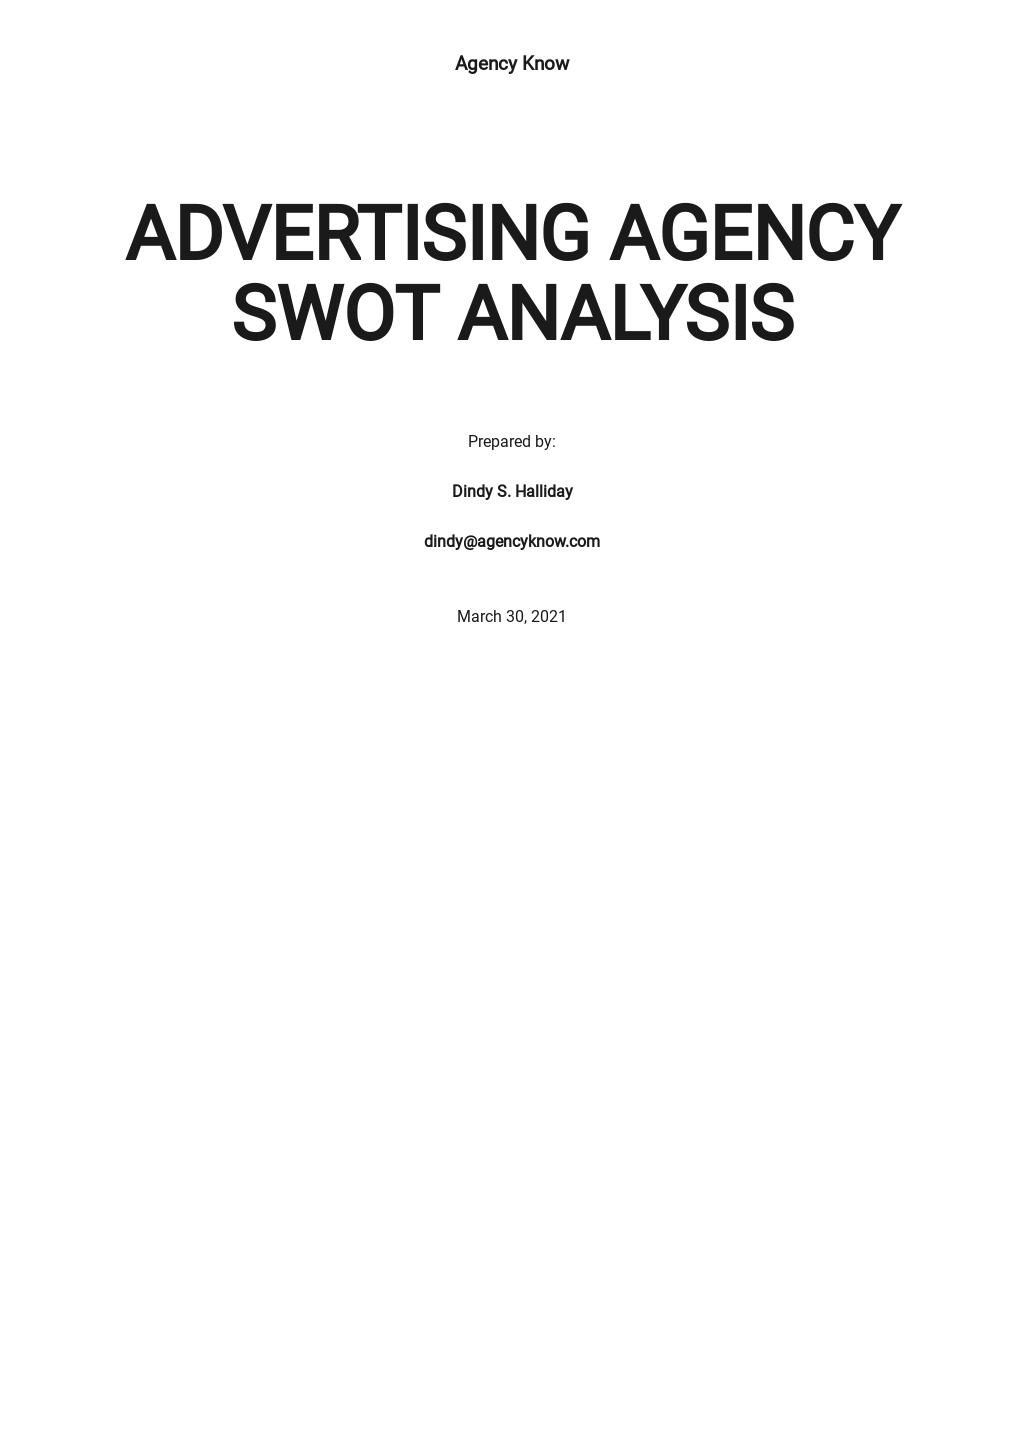 Advertising Agency SWOT Analysis Template.jpe